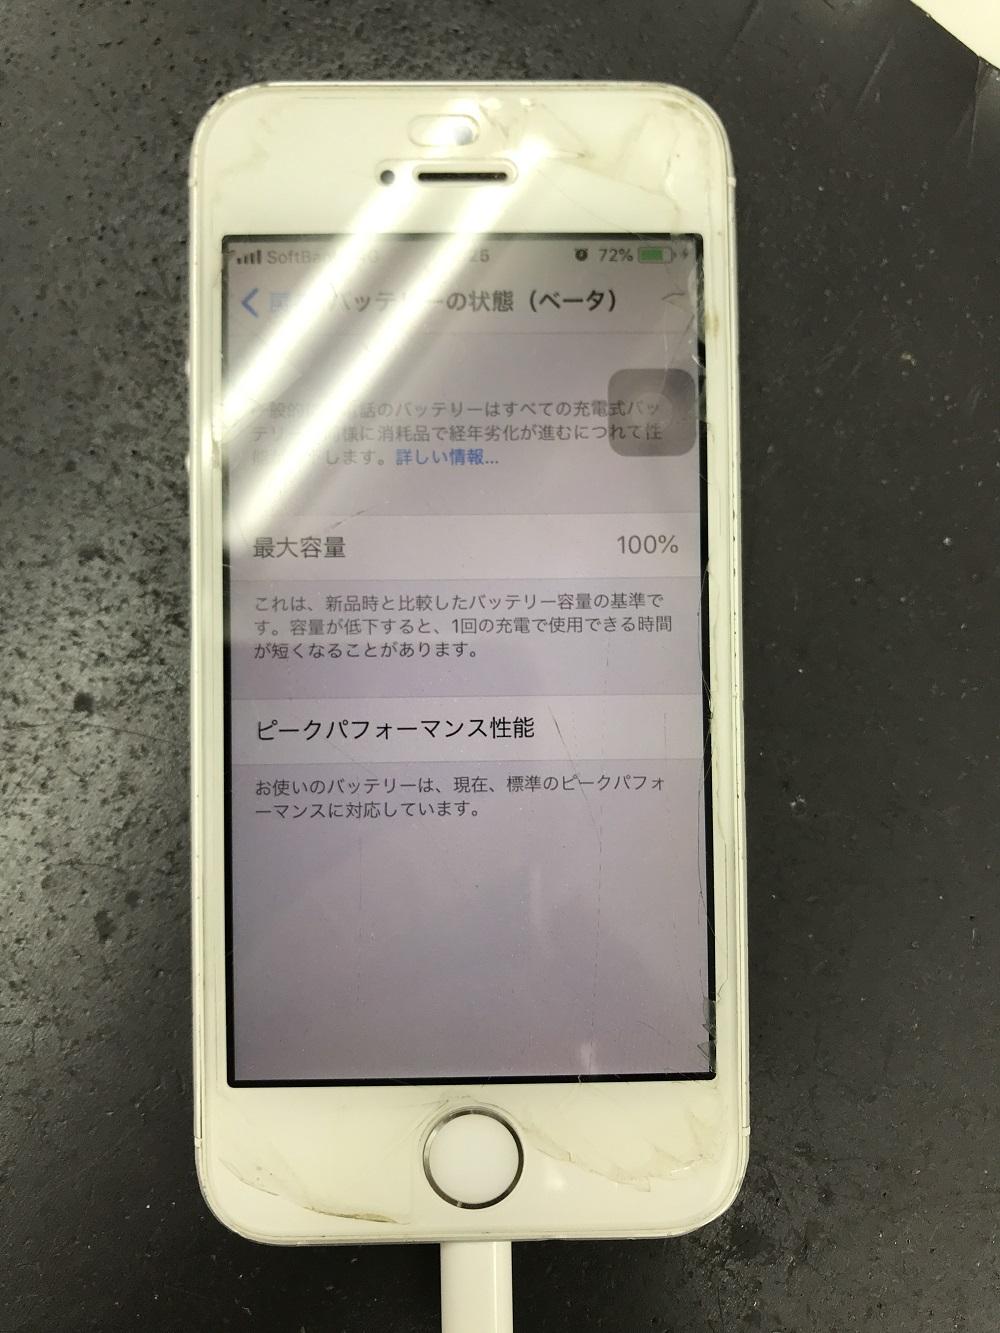 iPhoneSEバッテリー交換 修理後